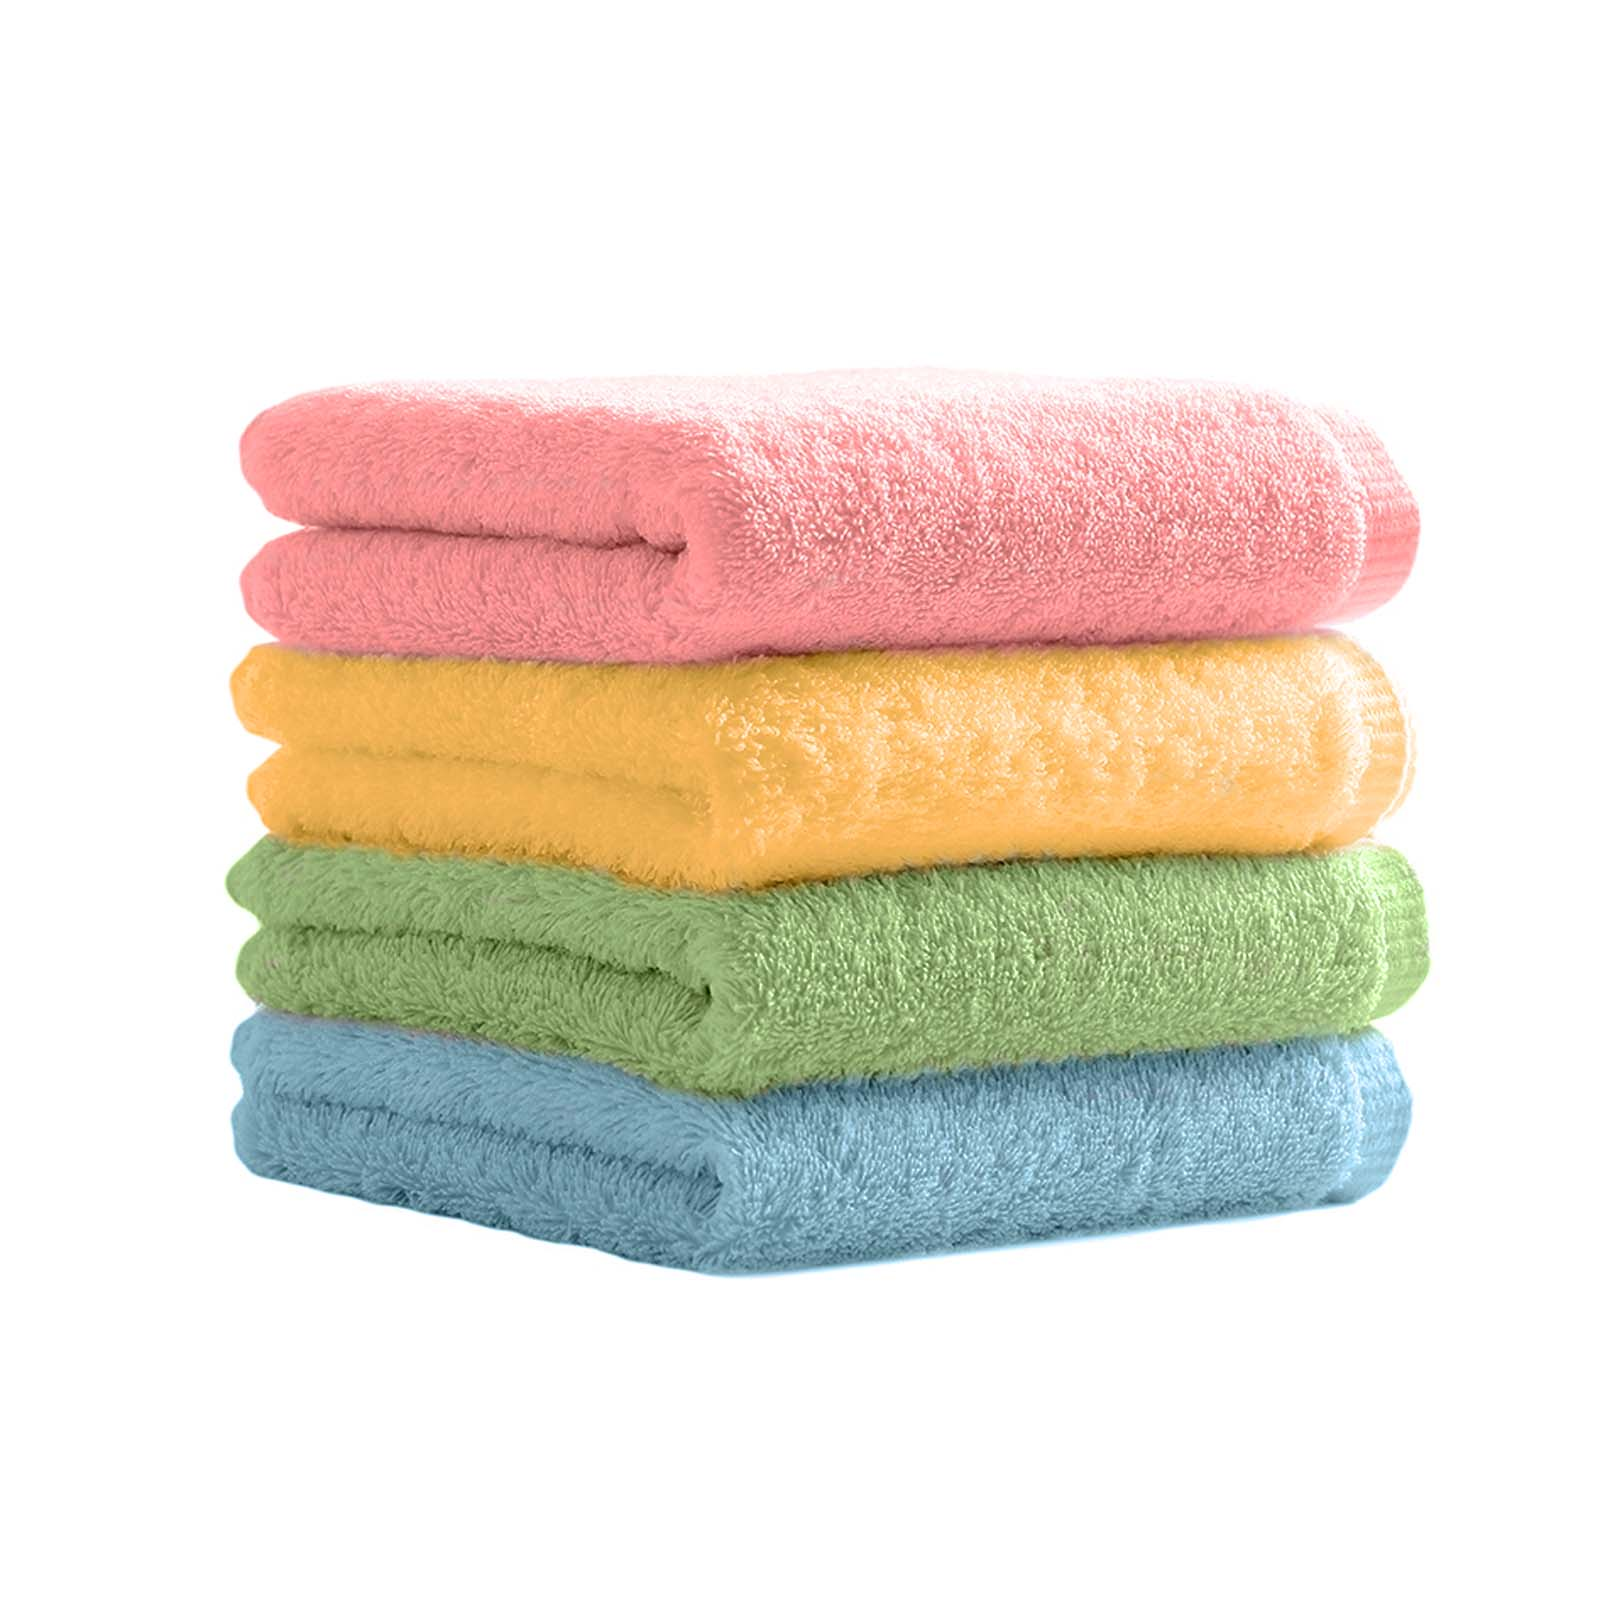 Набор кухонных полотенец Bonita Цукаты, 11011217513, 25 х 30 см, 4 шт набор полотенец bonita французская сирень 45 х 60 см 3 шт